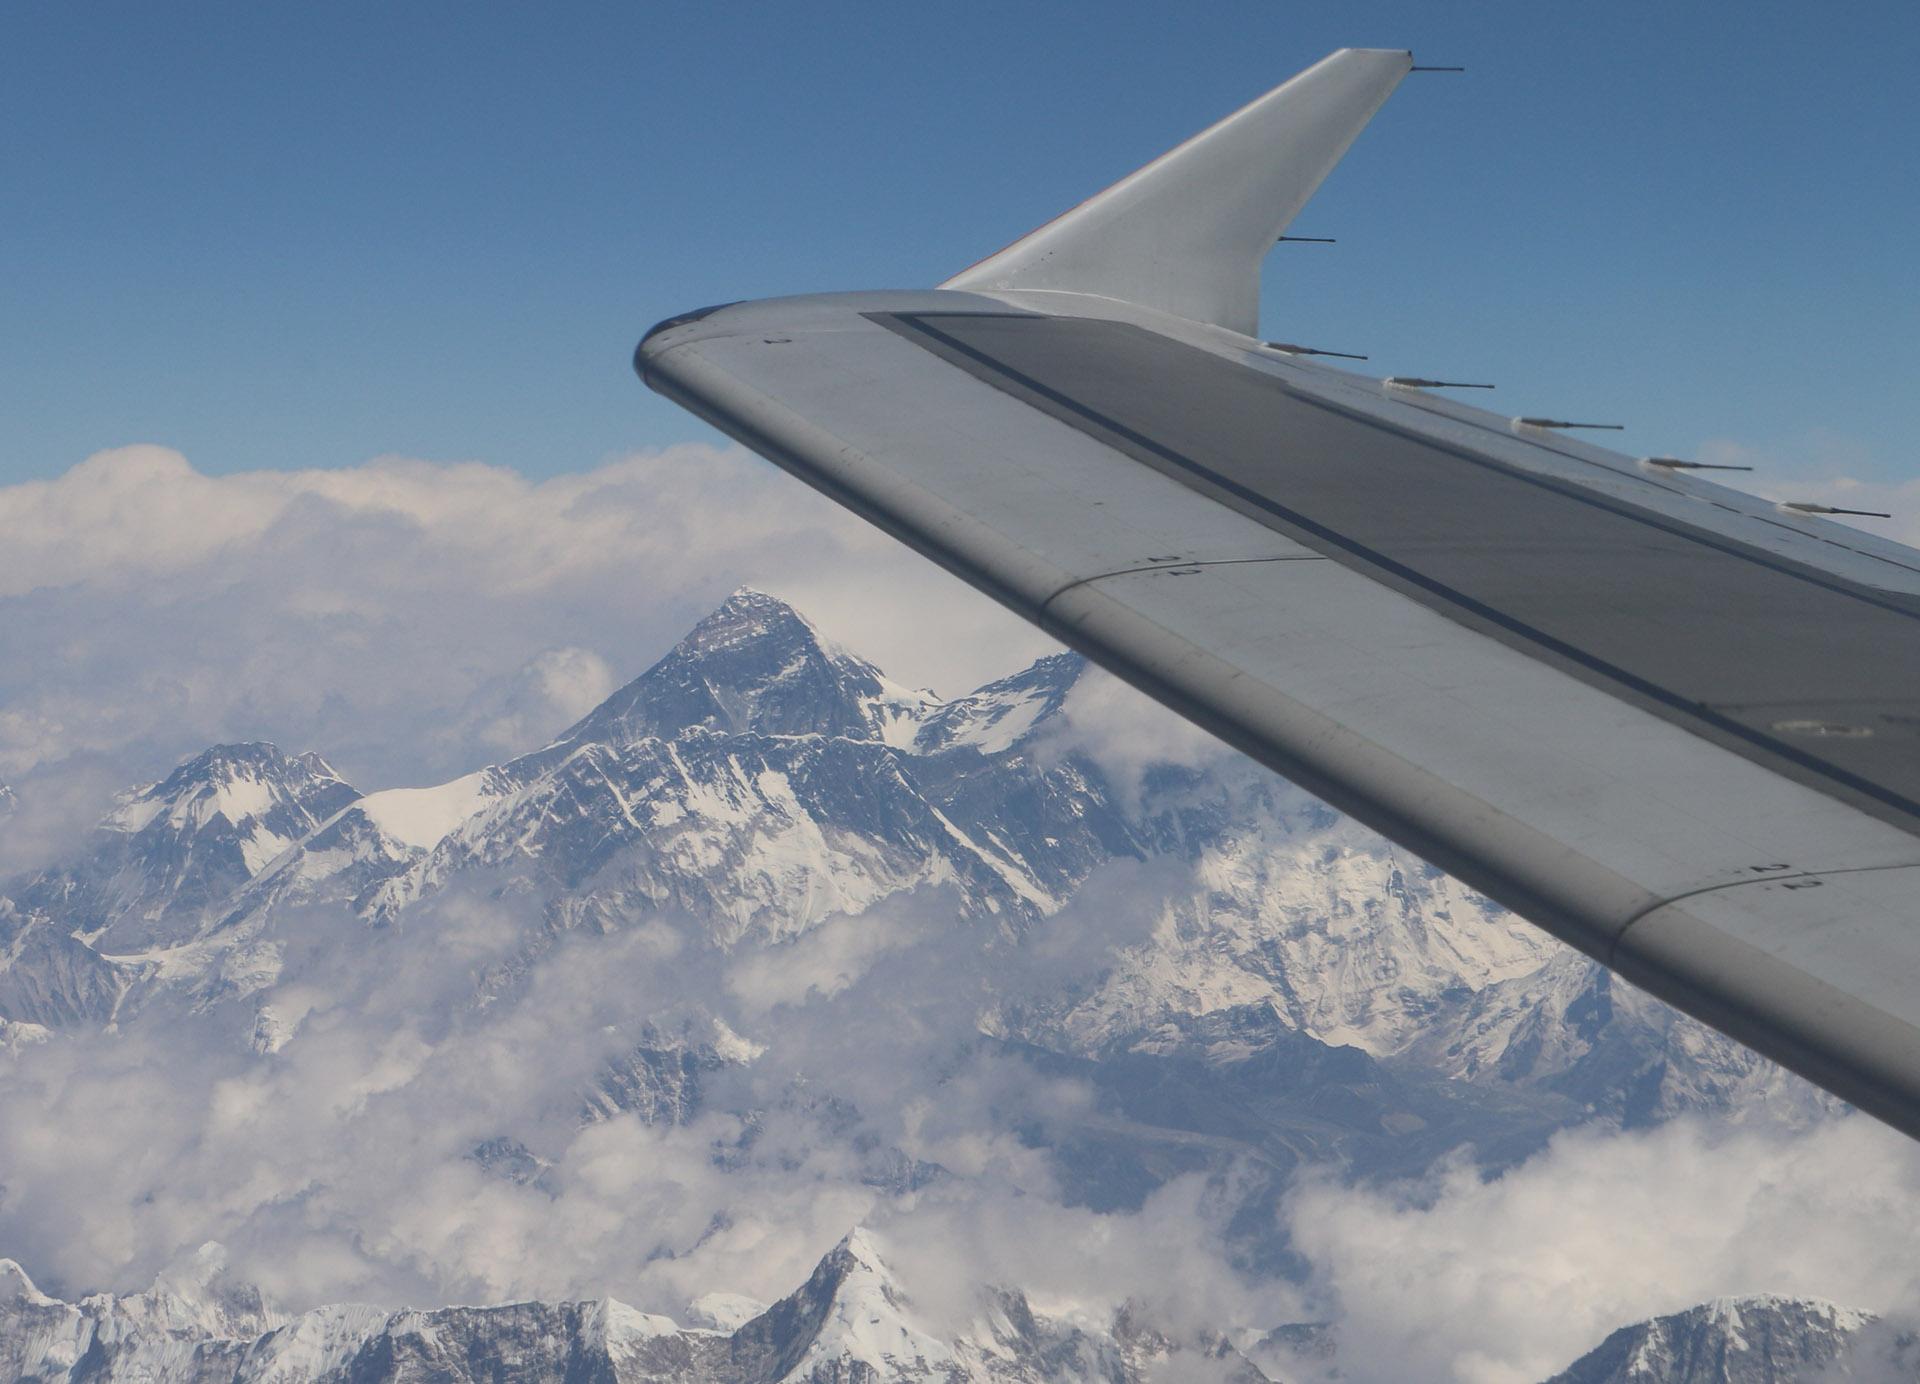 Everest Under Wing